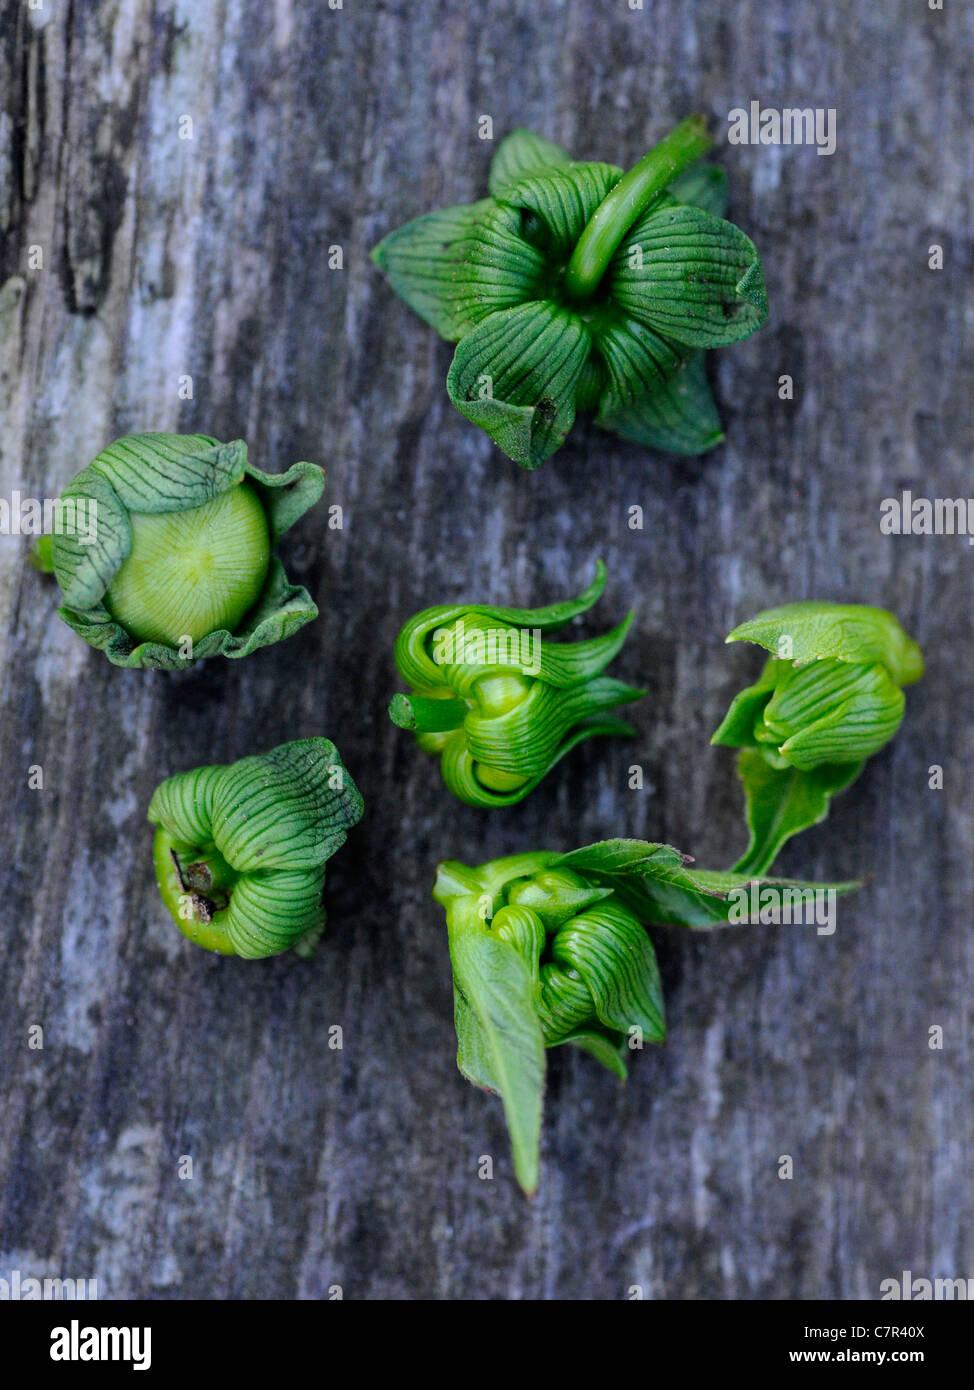 Removing dahlia buds - Stock Image